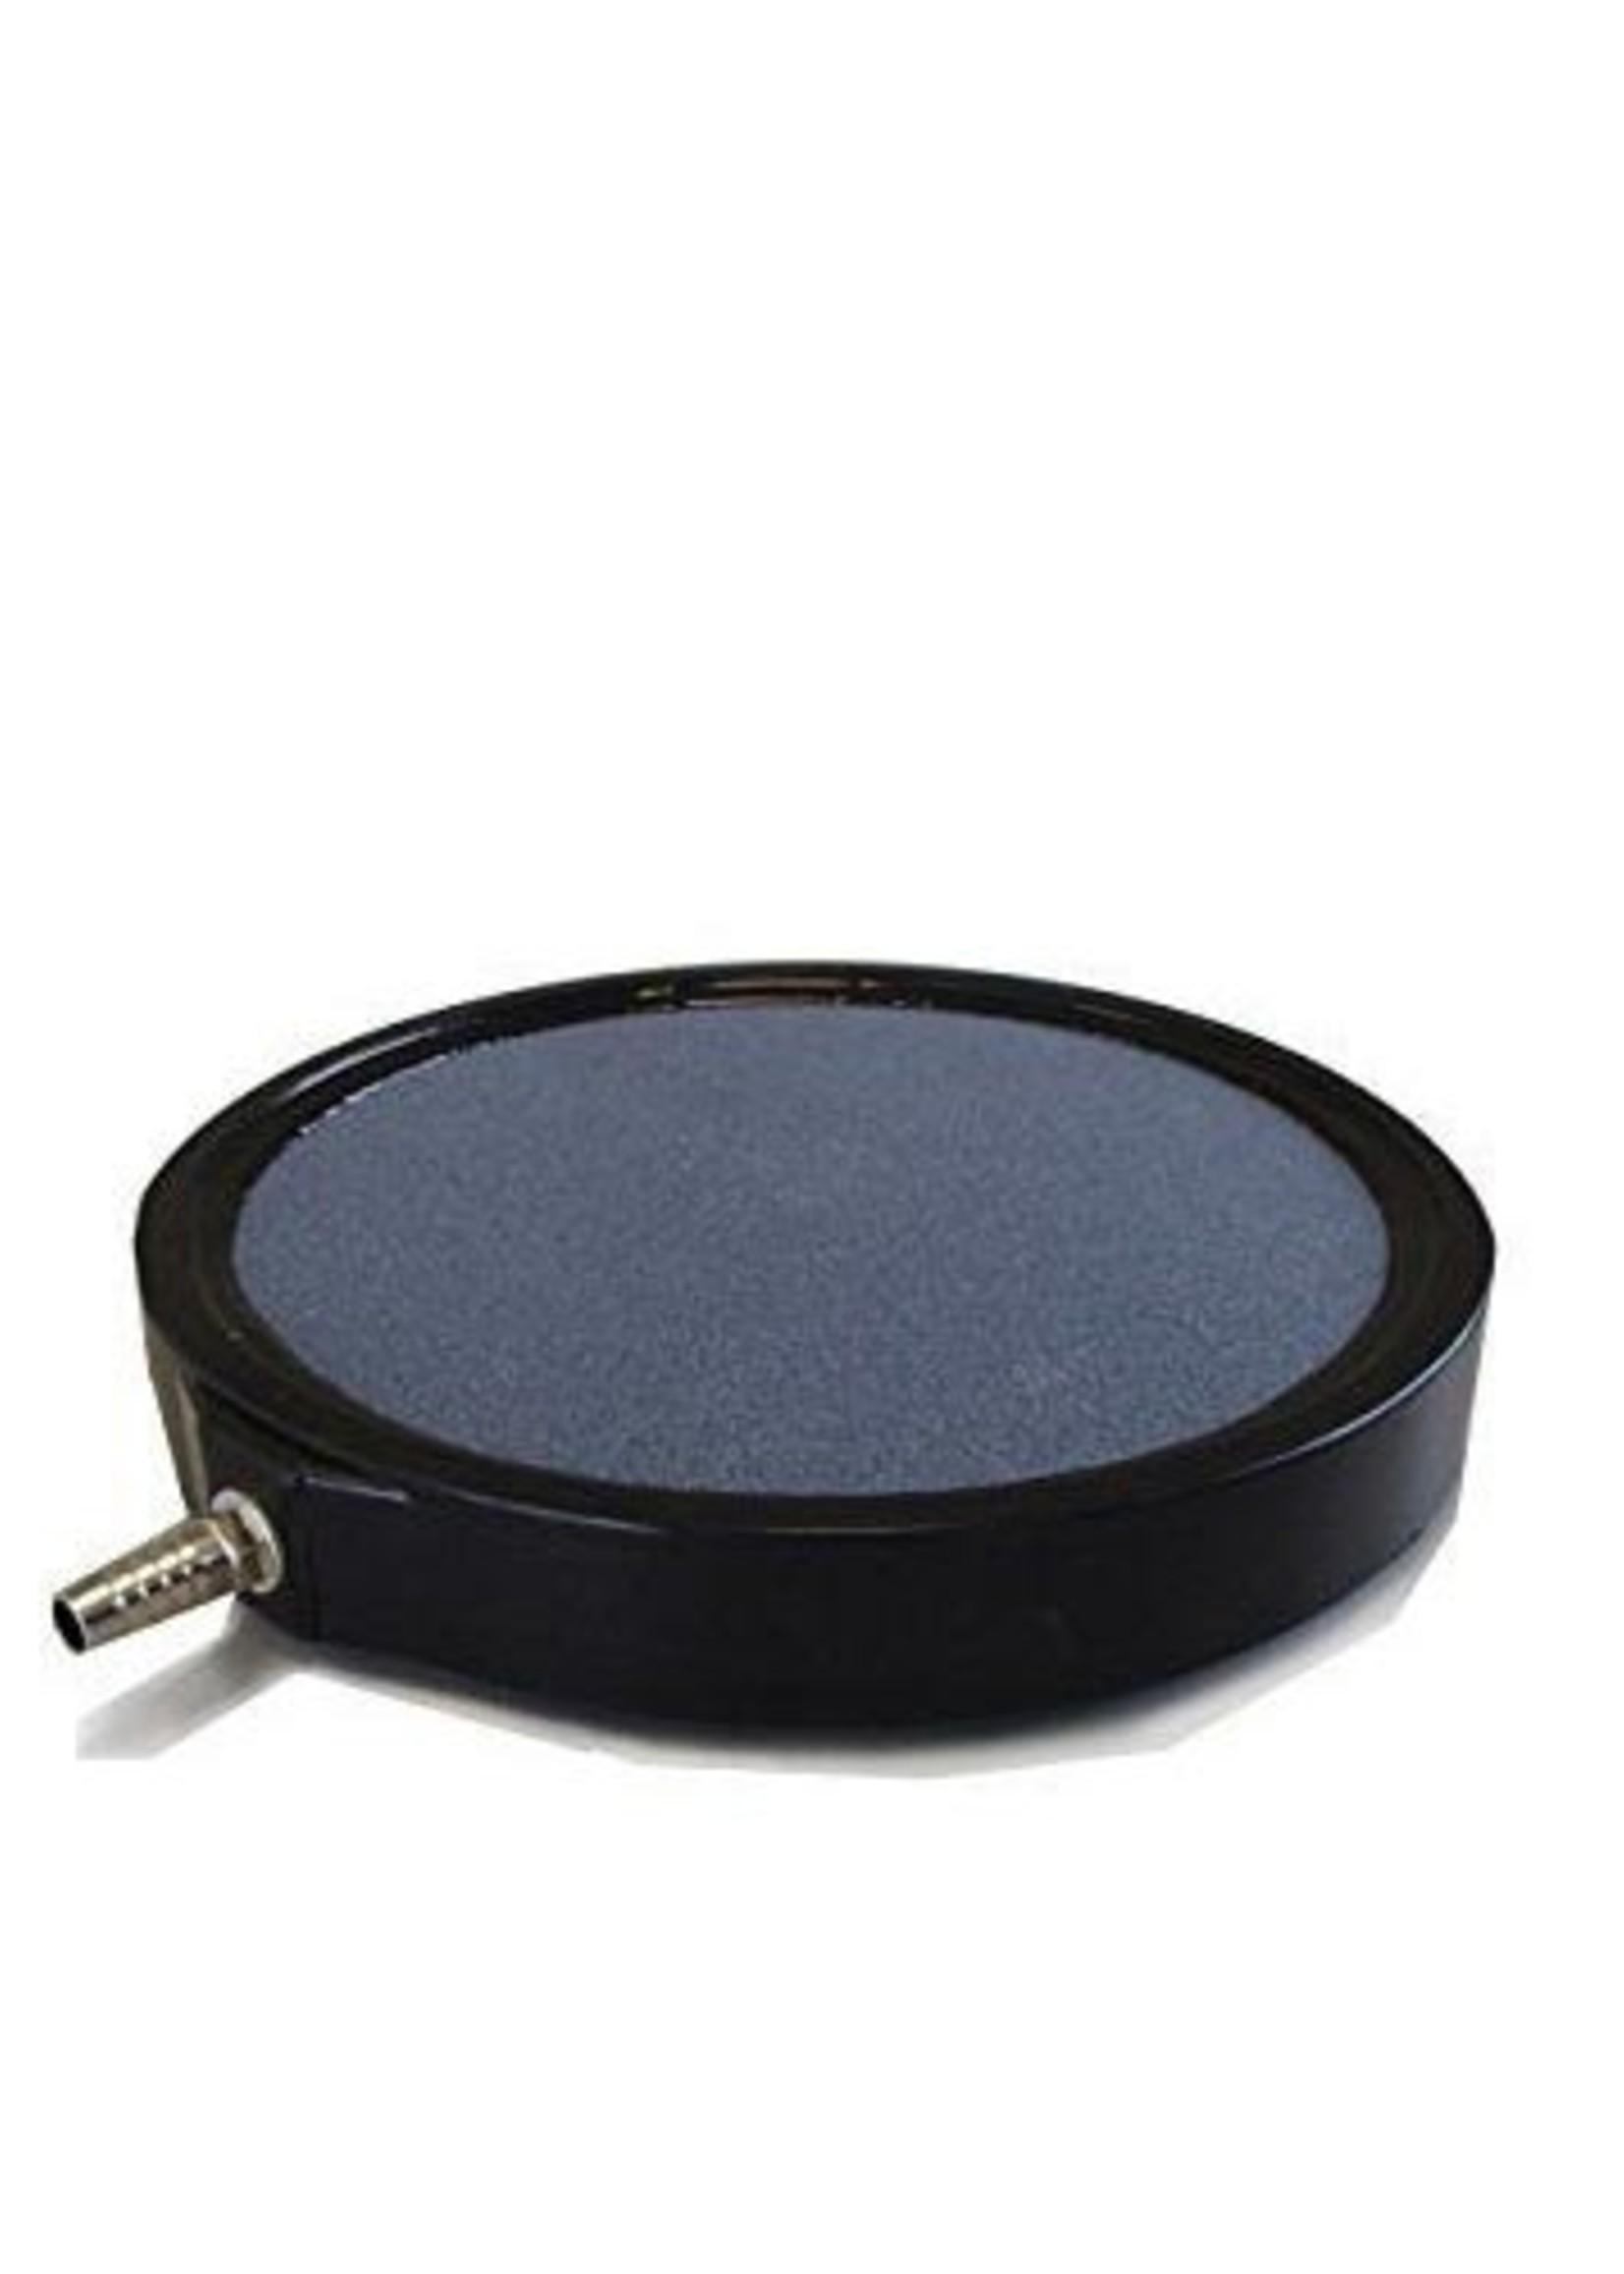 "Anjon Manufacturing Anjon 5"" Pond Aeration Micro-Bubble Diffuser Disc"